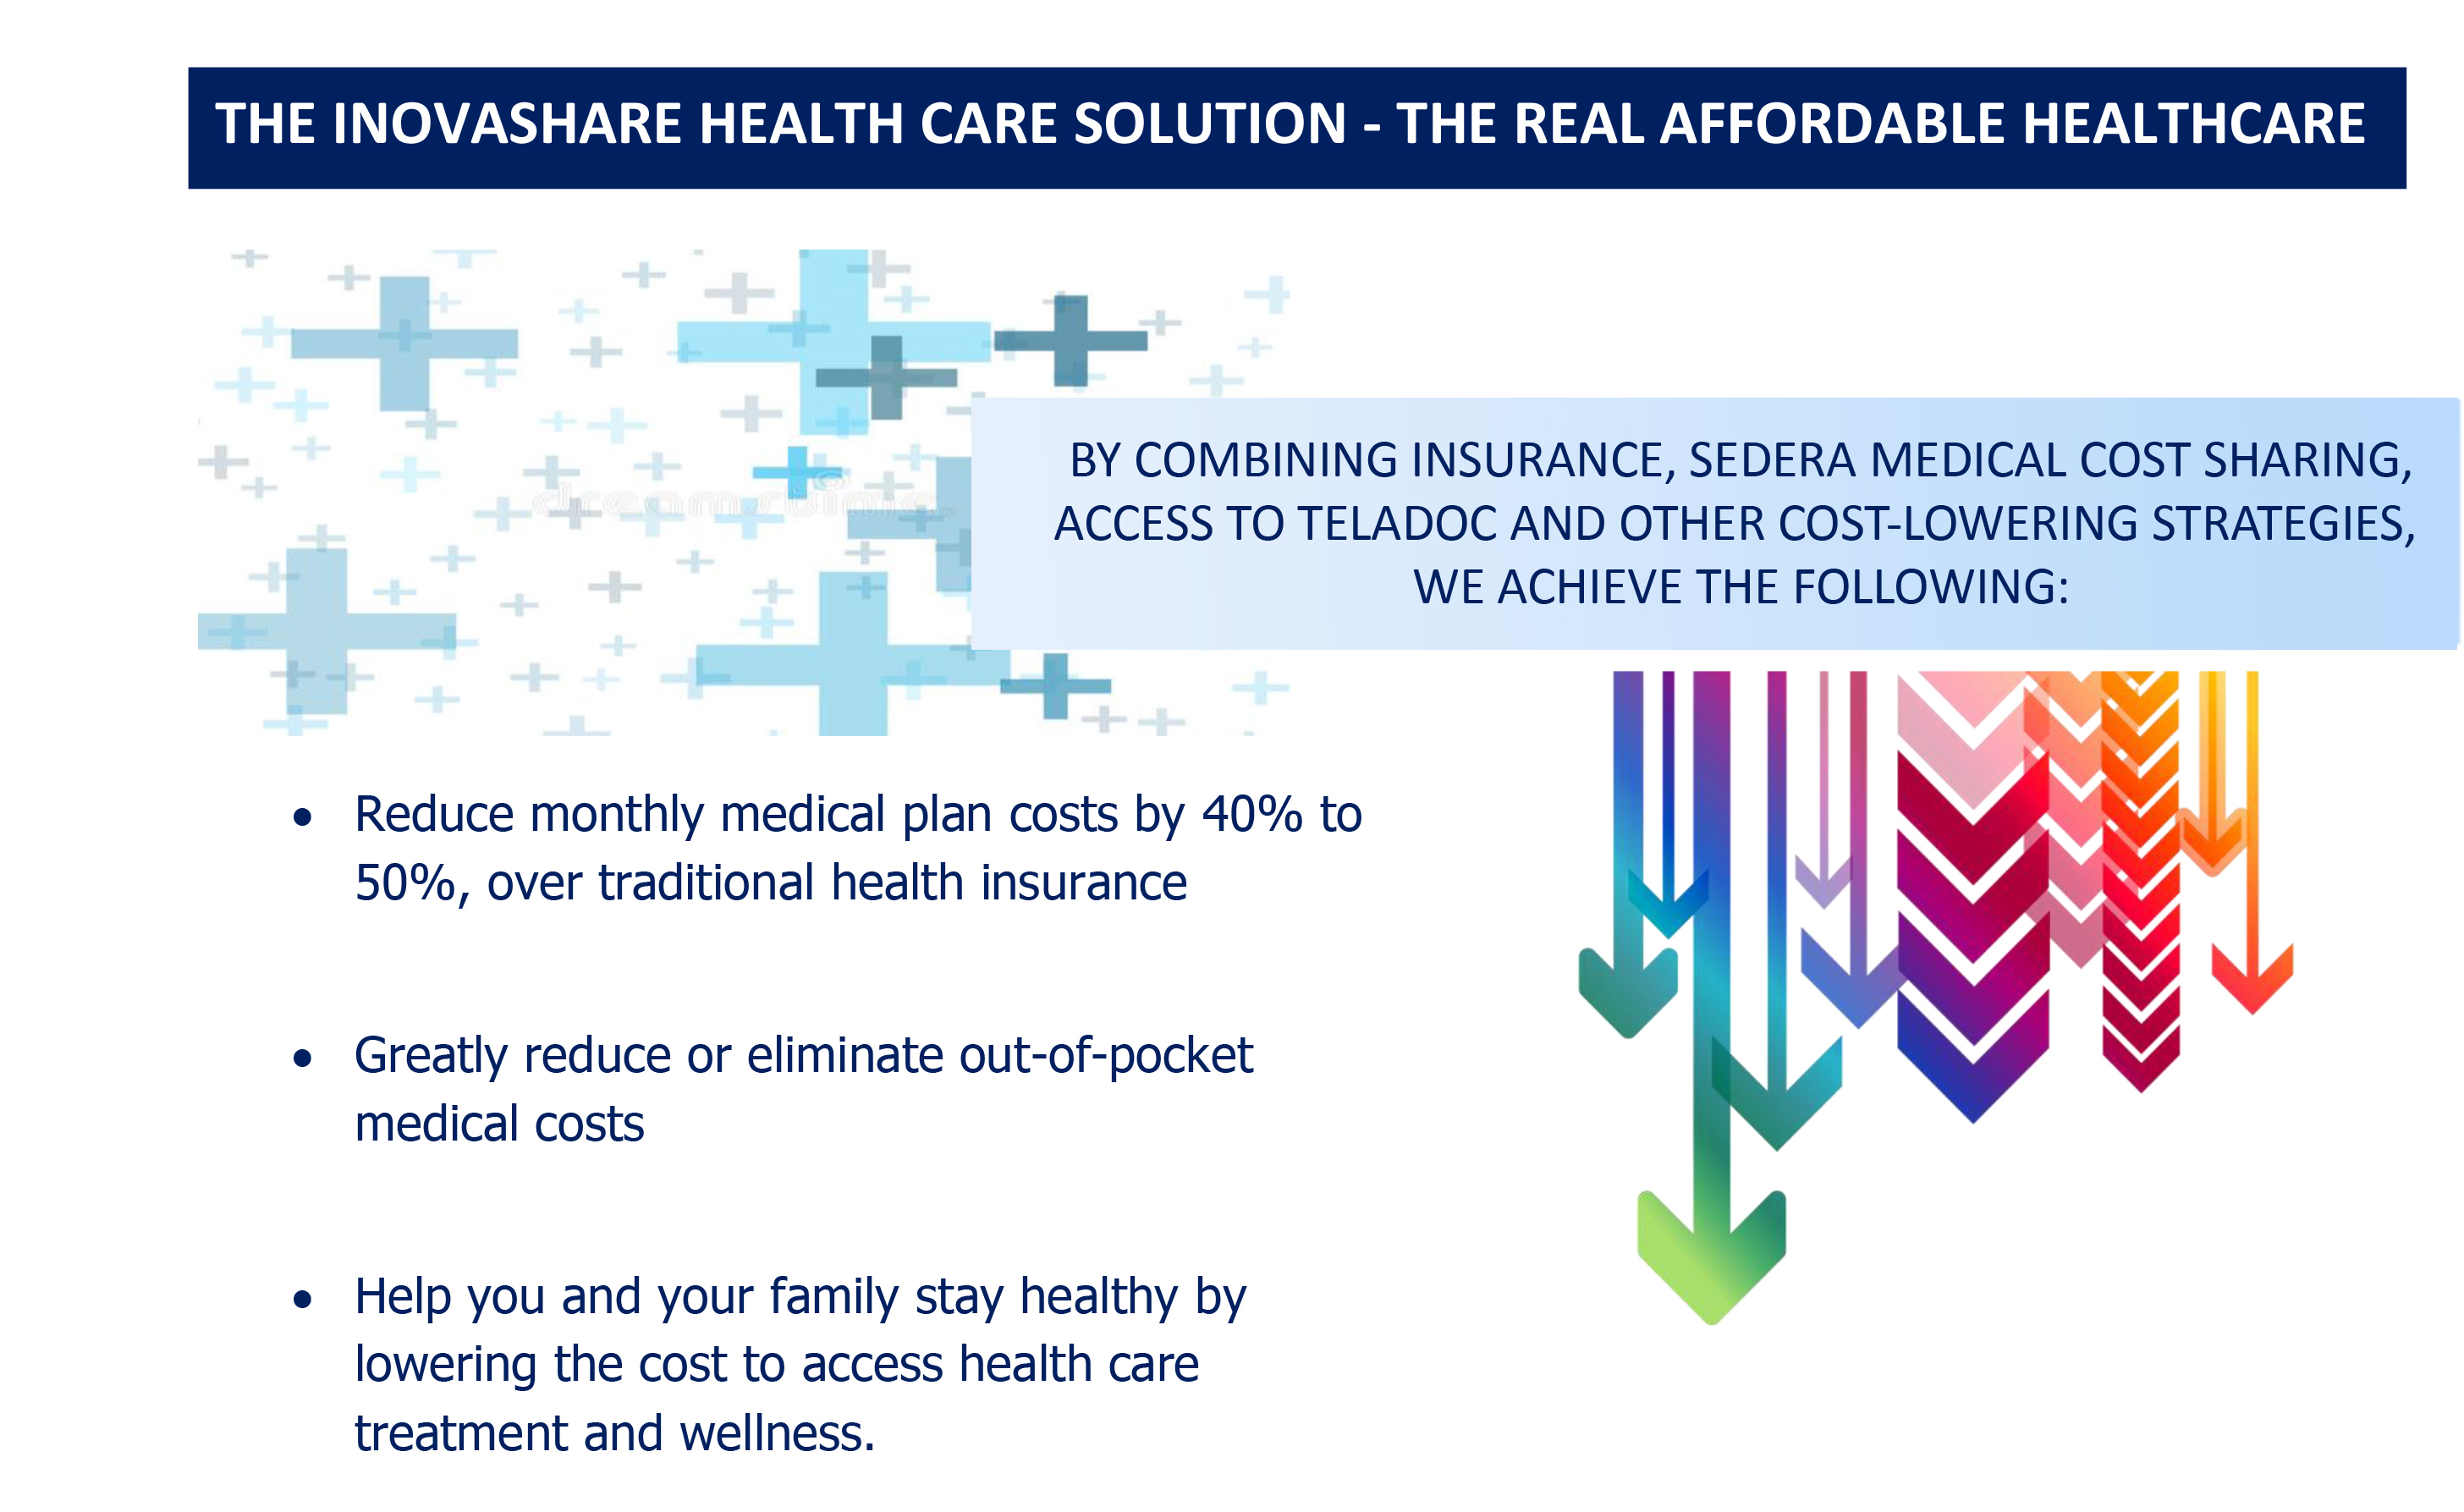 Inovashare healthcare solution